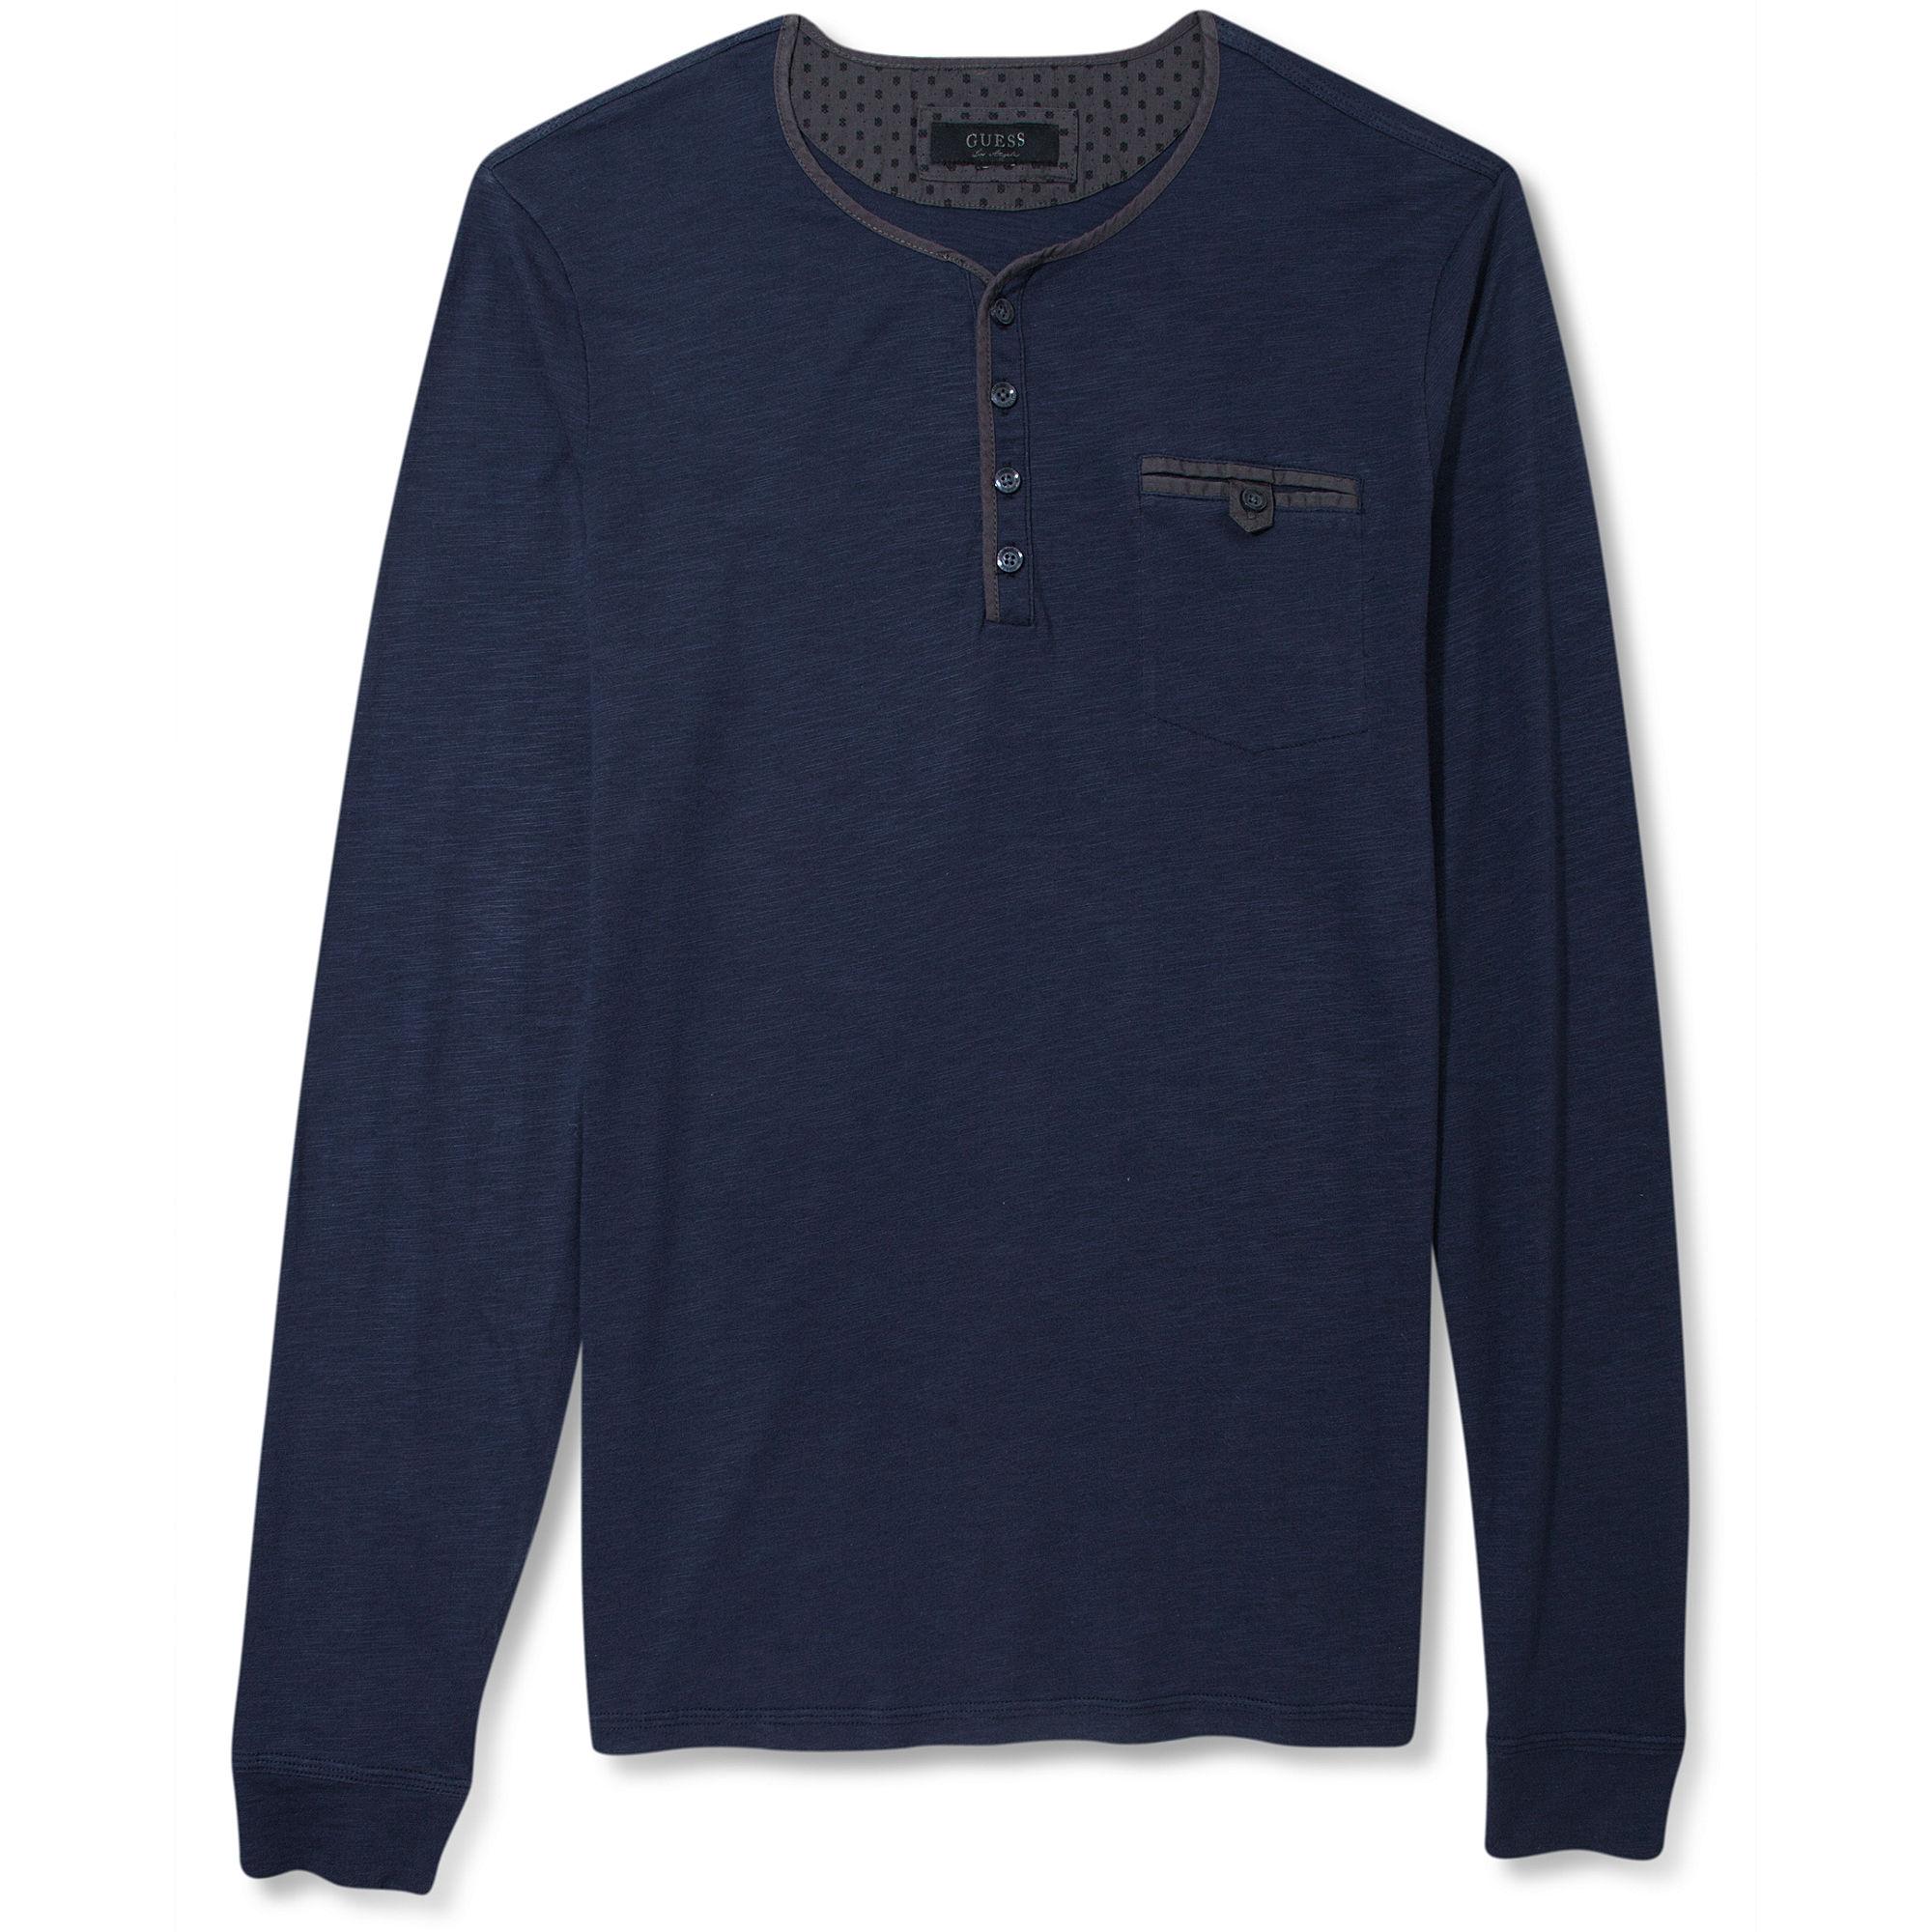 Guess Jeans Shirt Longsleeve Henley In Blue For Men